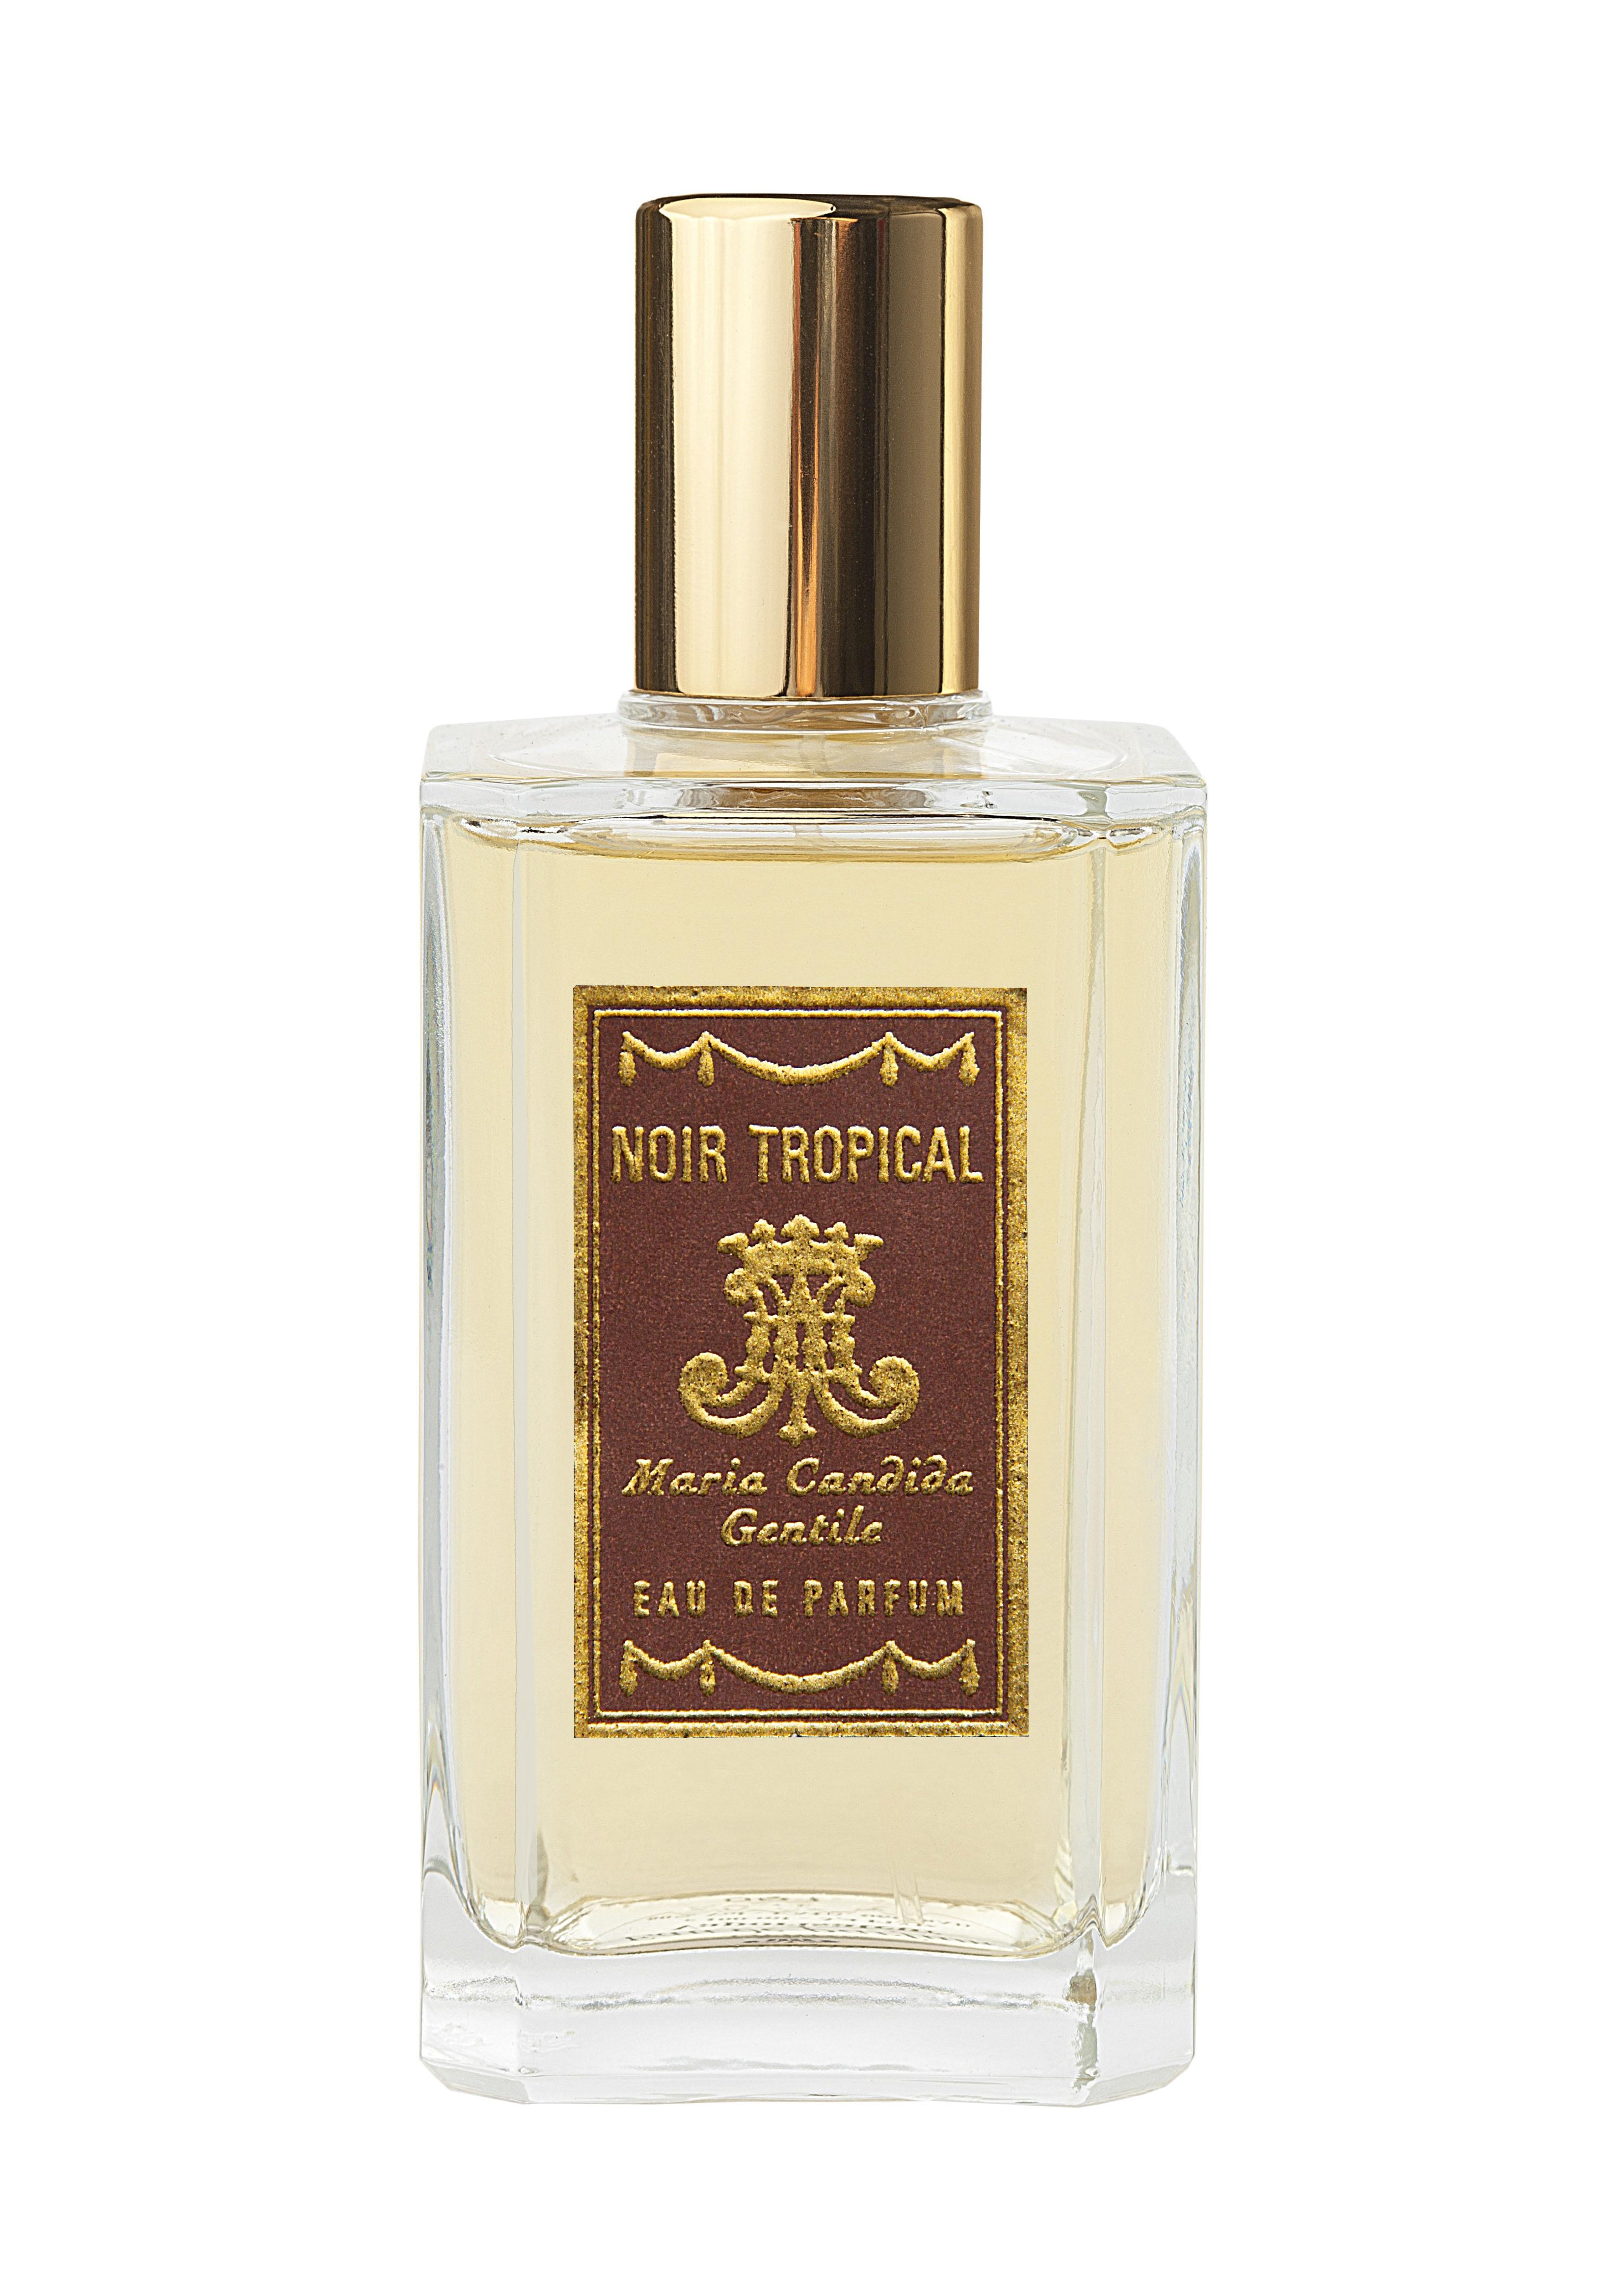 Maria Candida gentile_Officina Parfum_master_noir_tropical